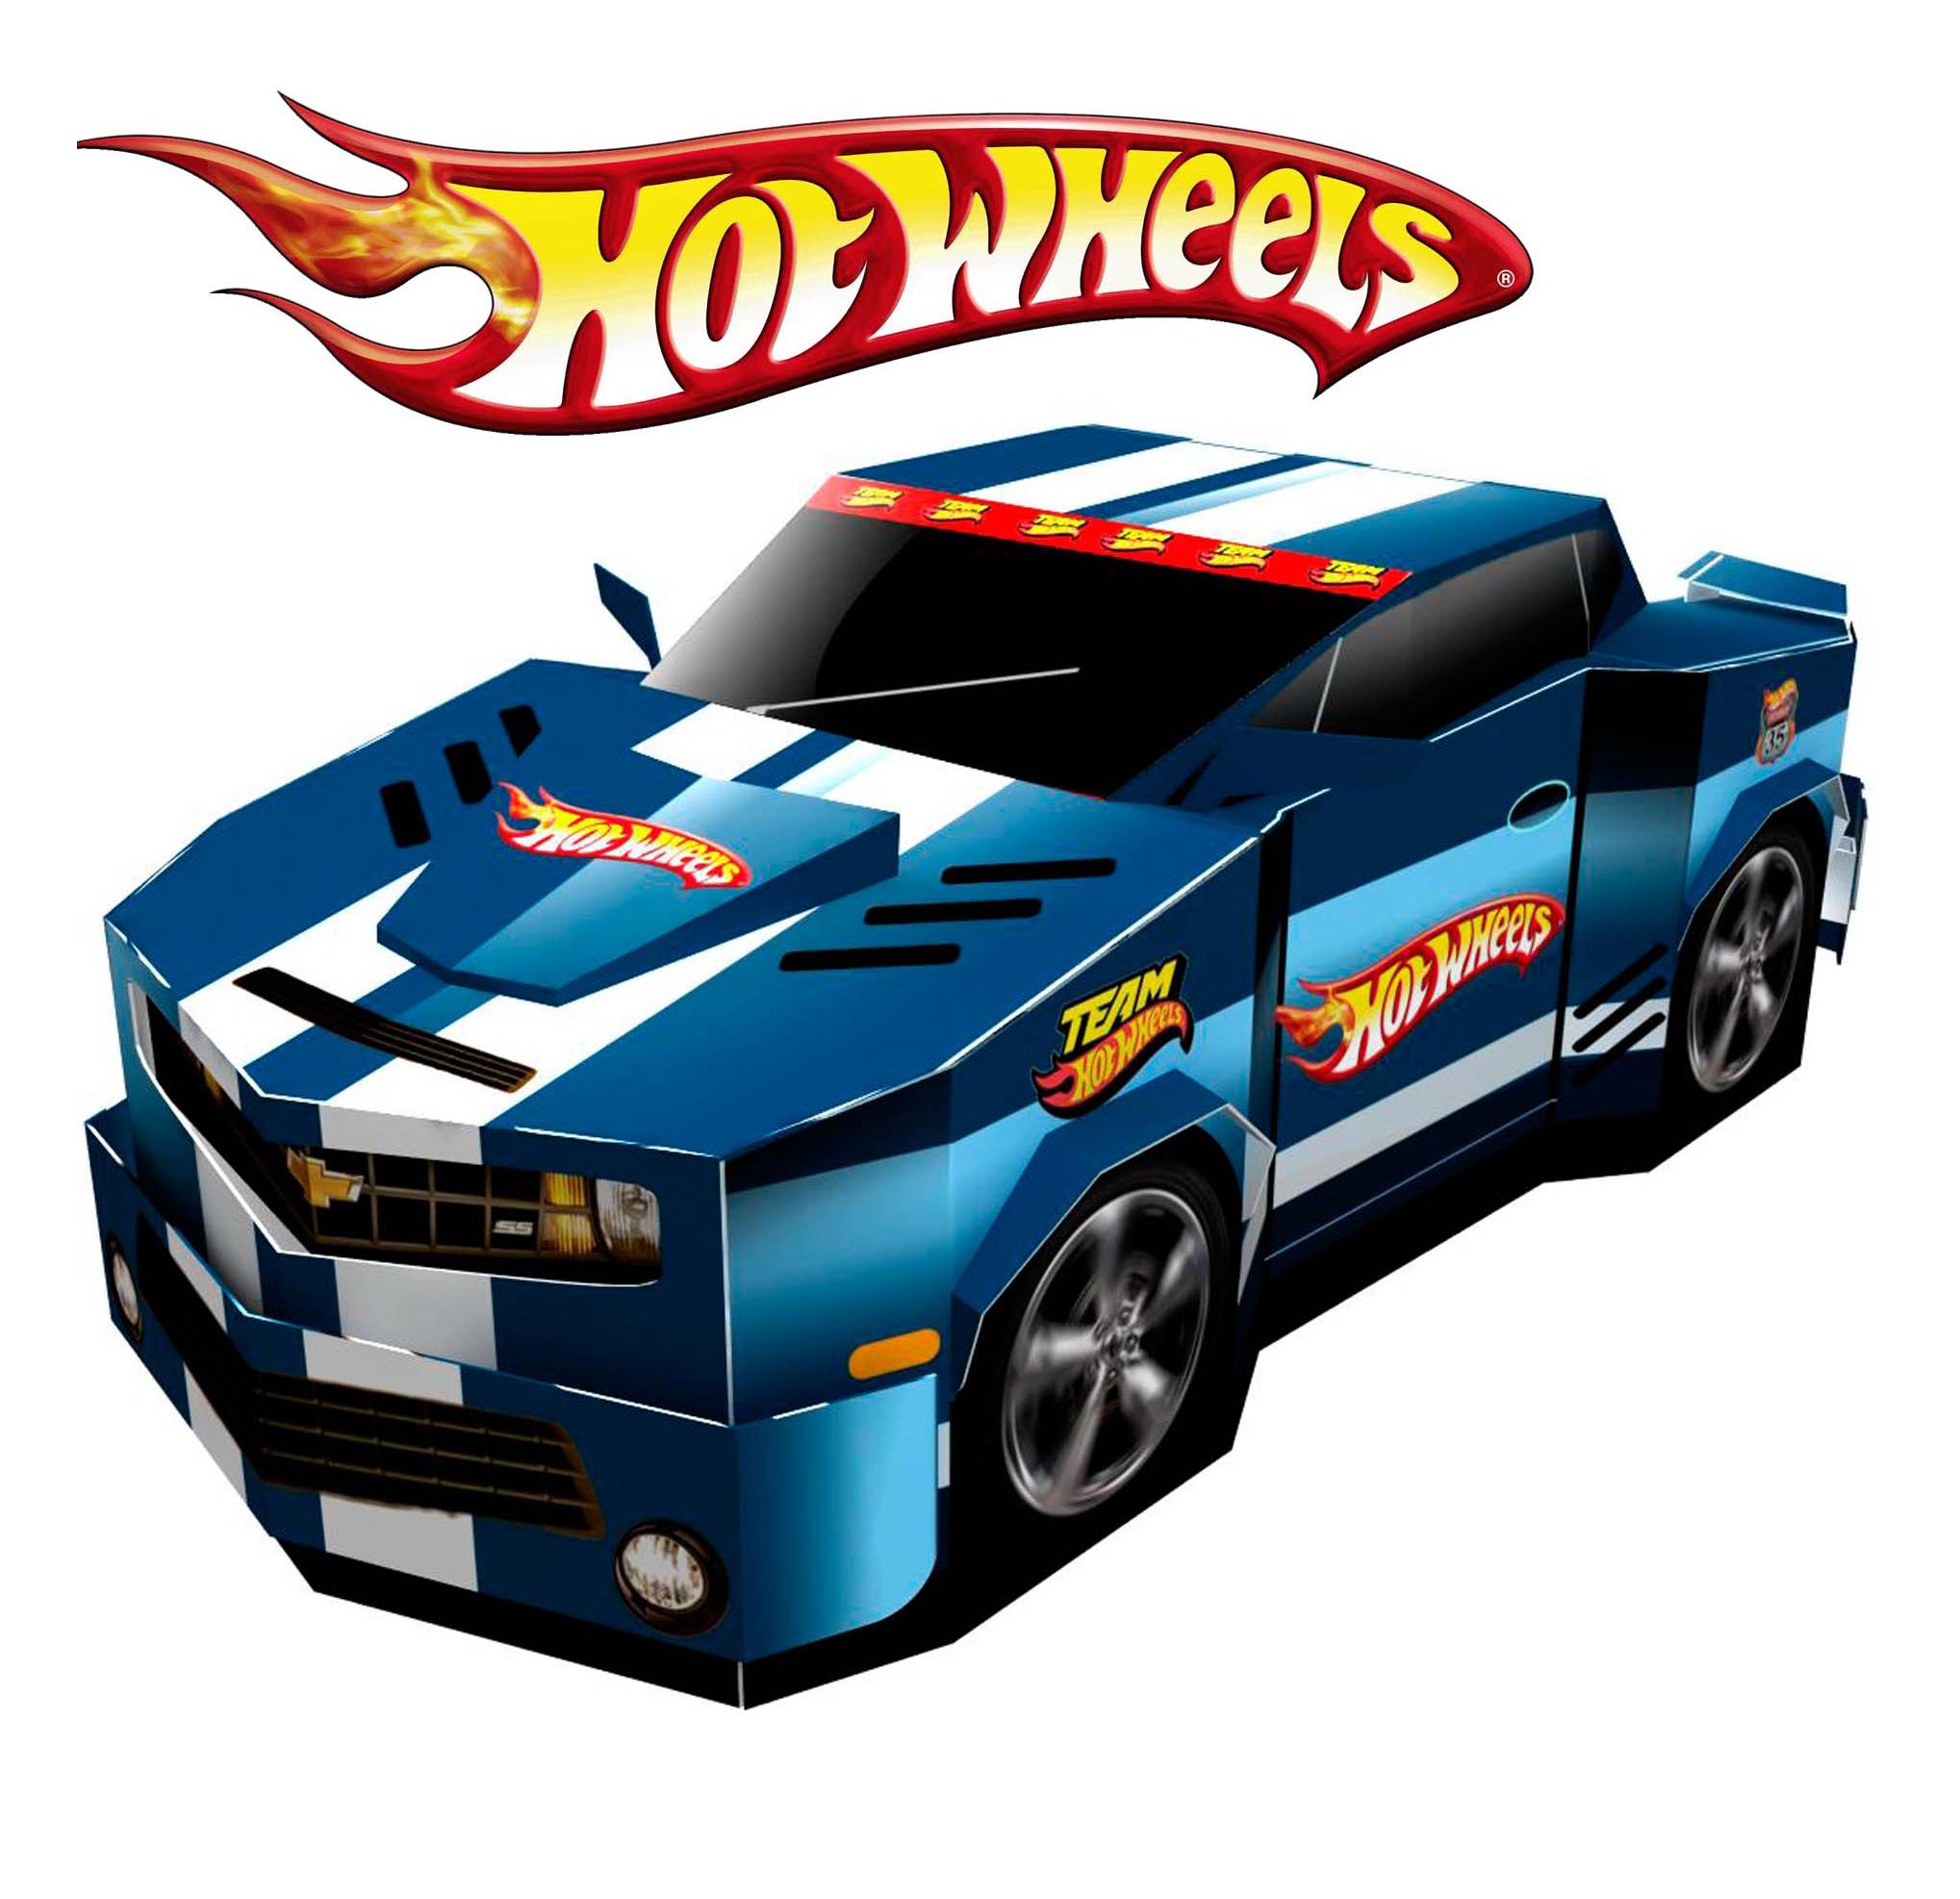 Hot Wheels clipart cartoon Wheels World Car Racing Hot